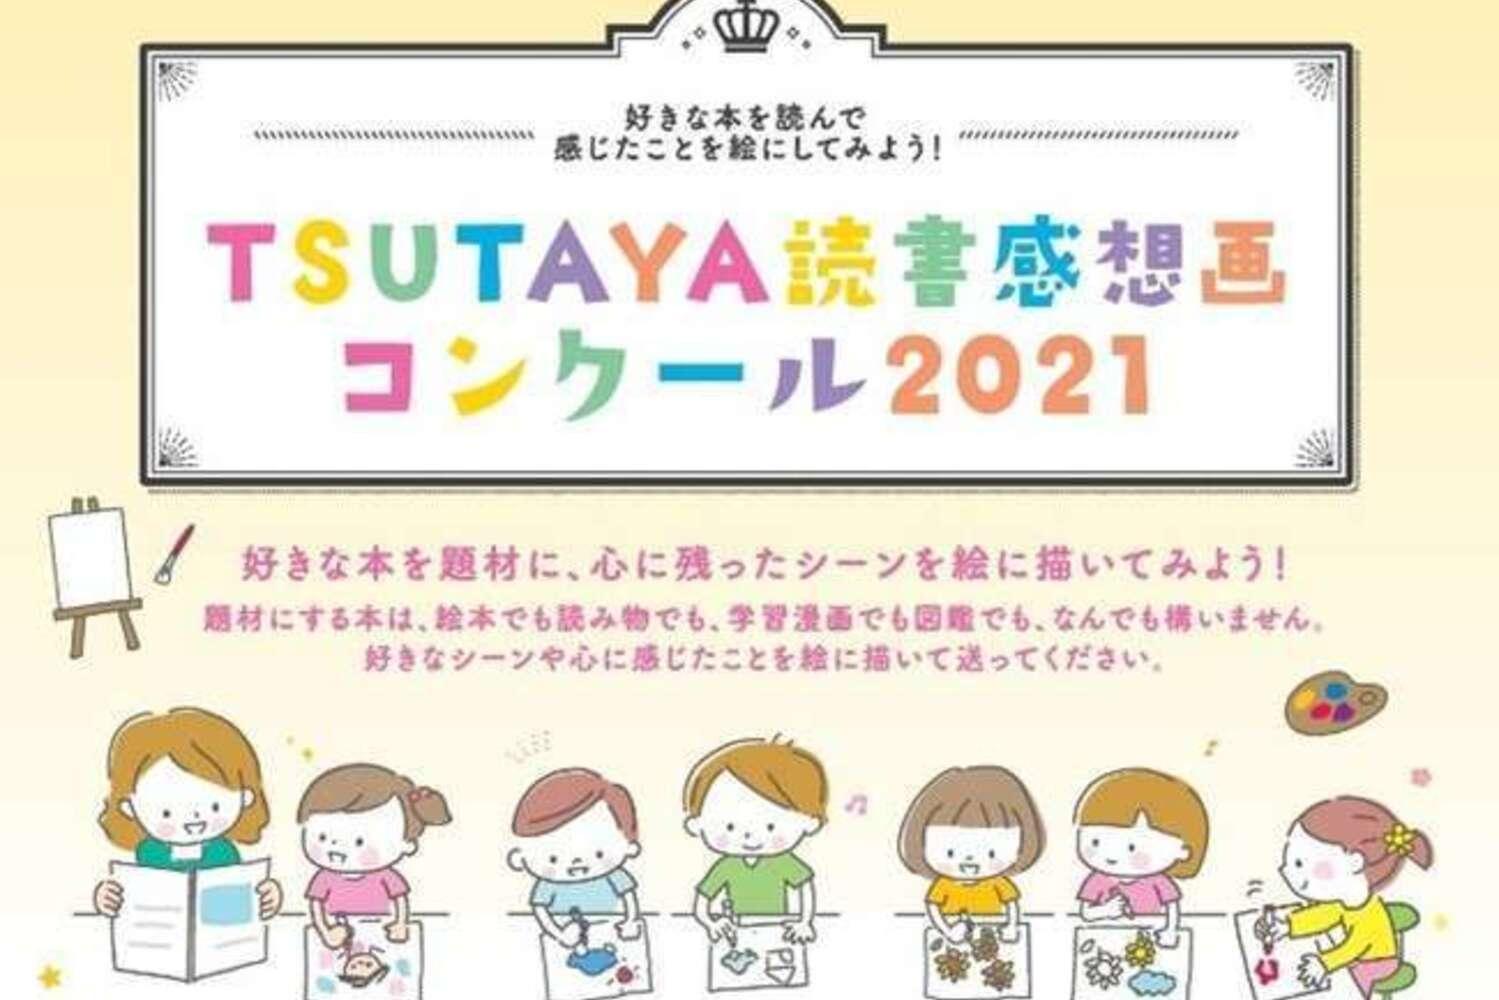 TSUTAYA読書感想画コンクール2021 ―CCCの日常